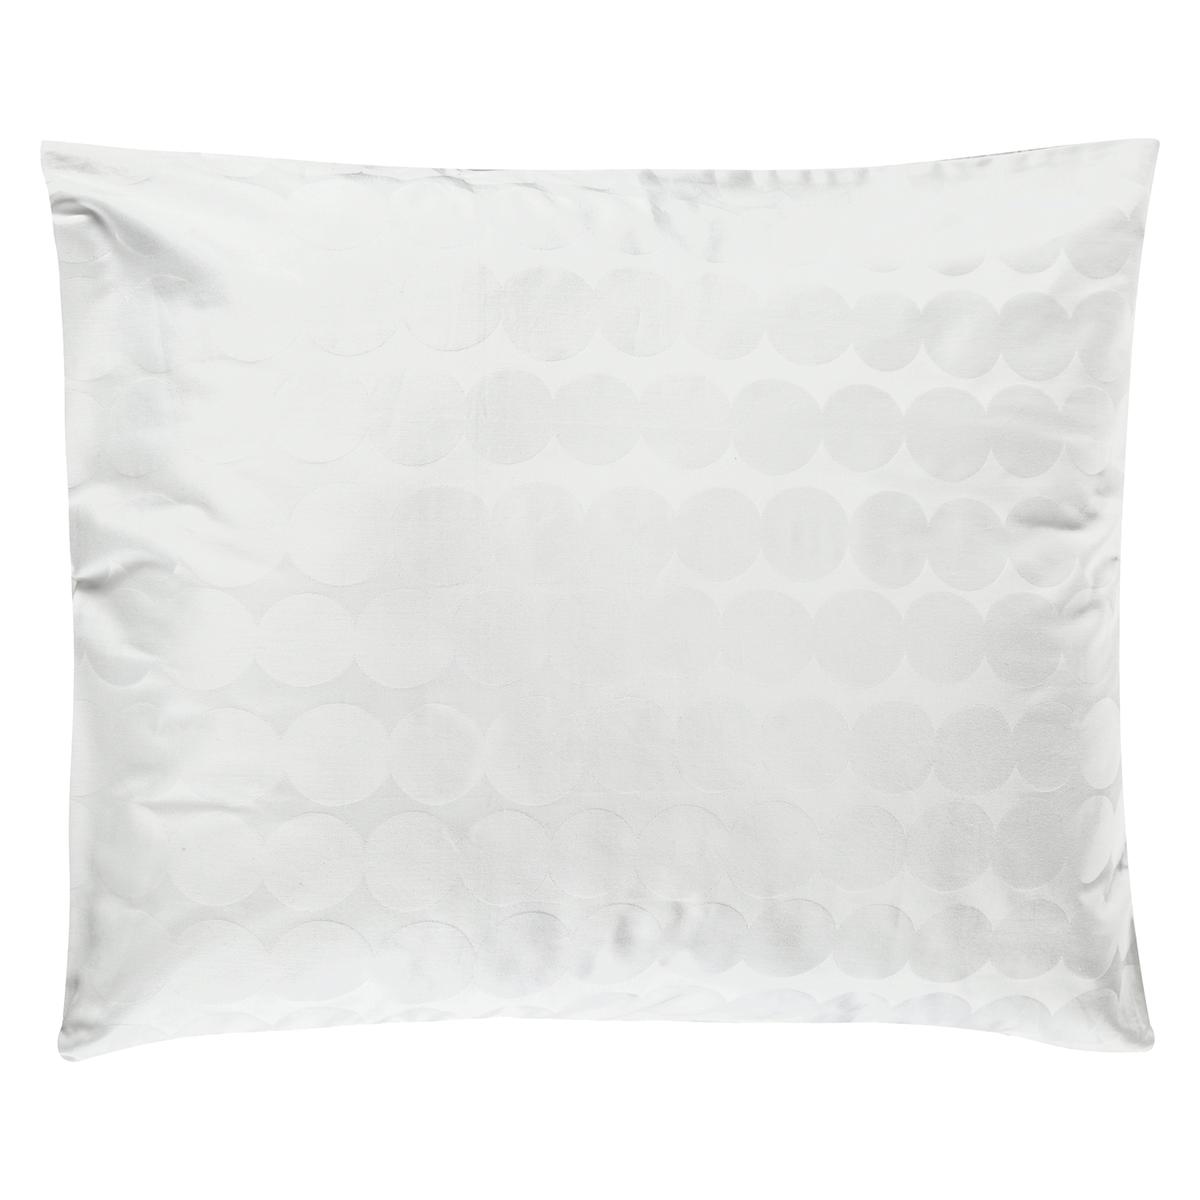 Marimekko Räsymatto Pillowcase, White